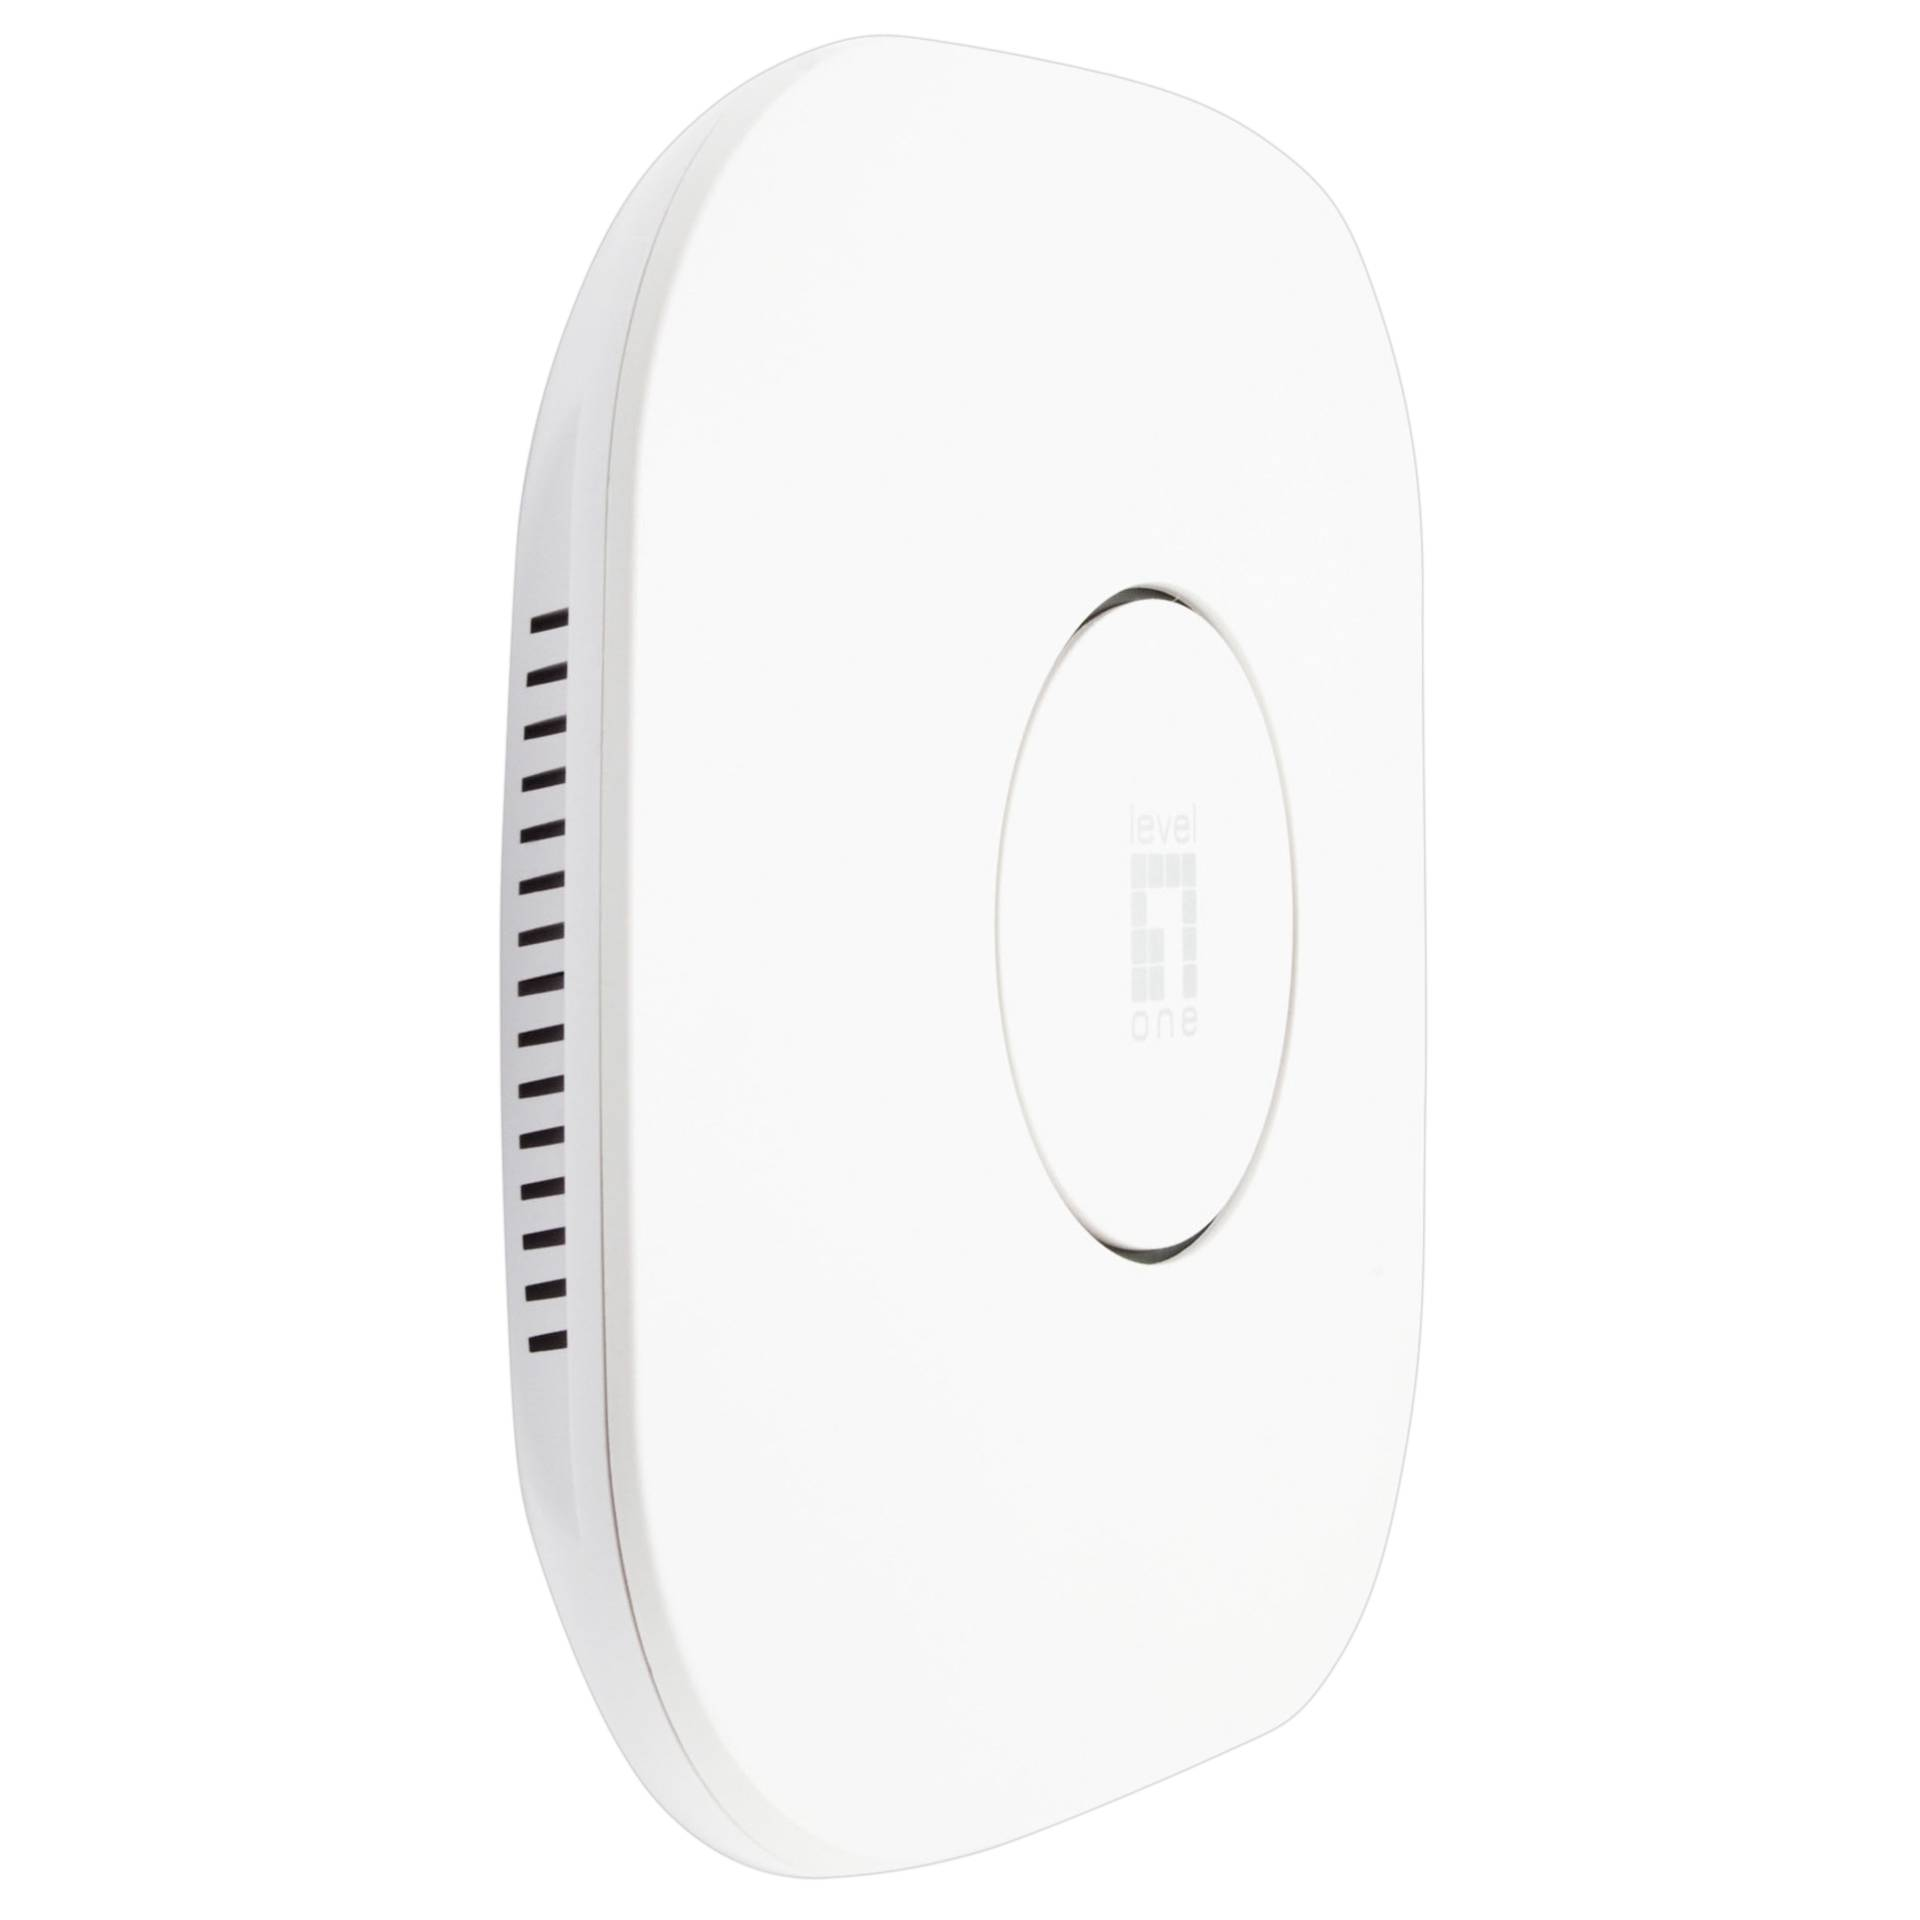 Level One WAP-6121 Wireless Access Point